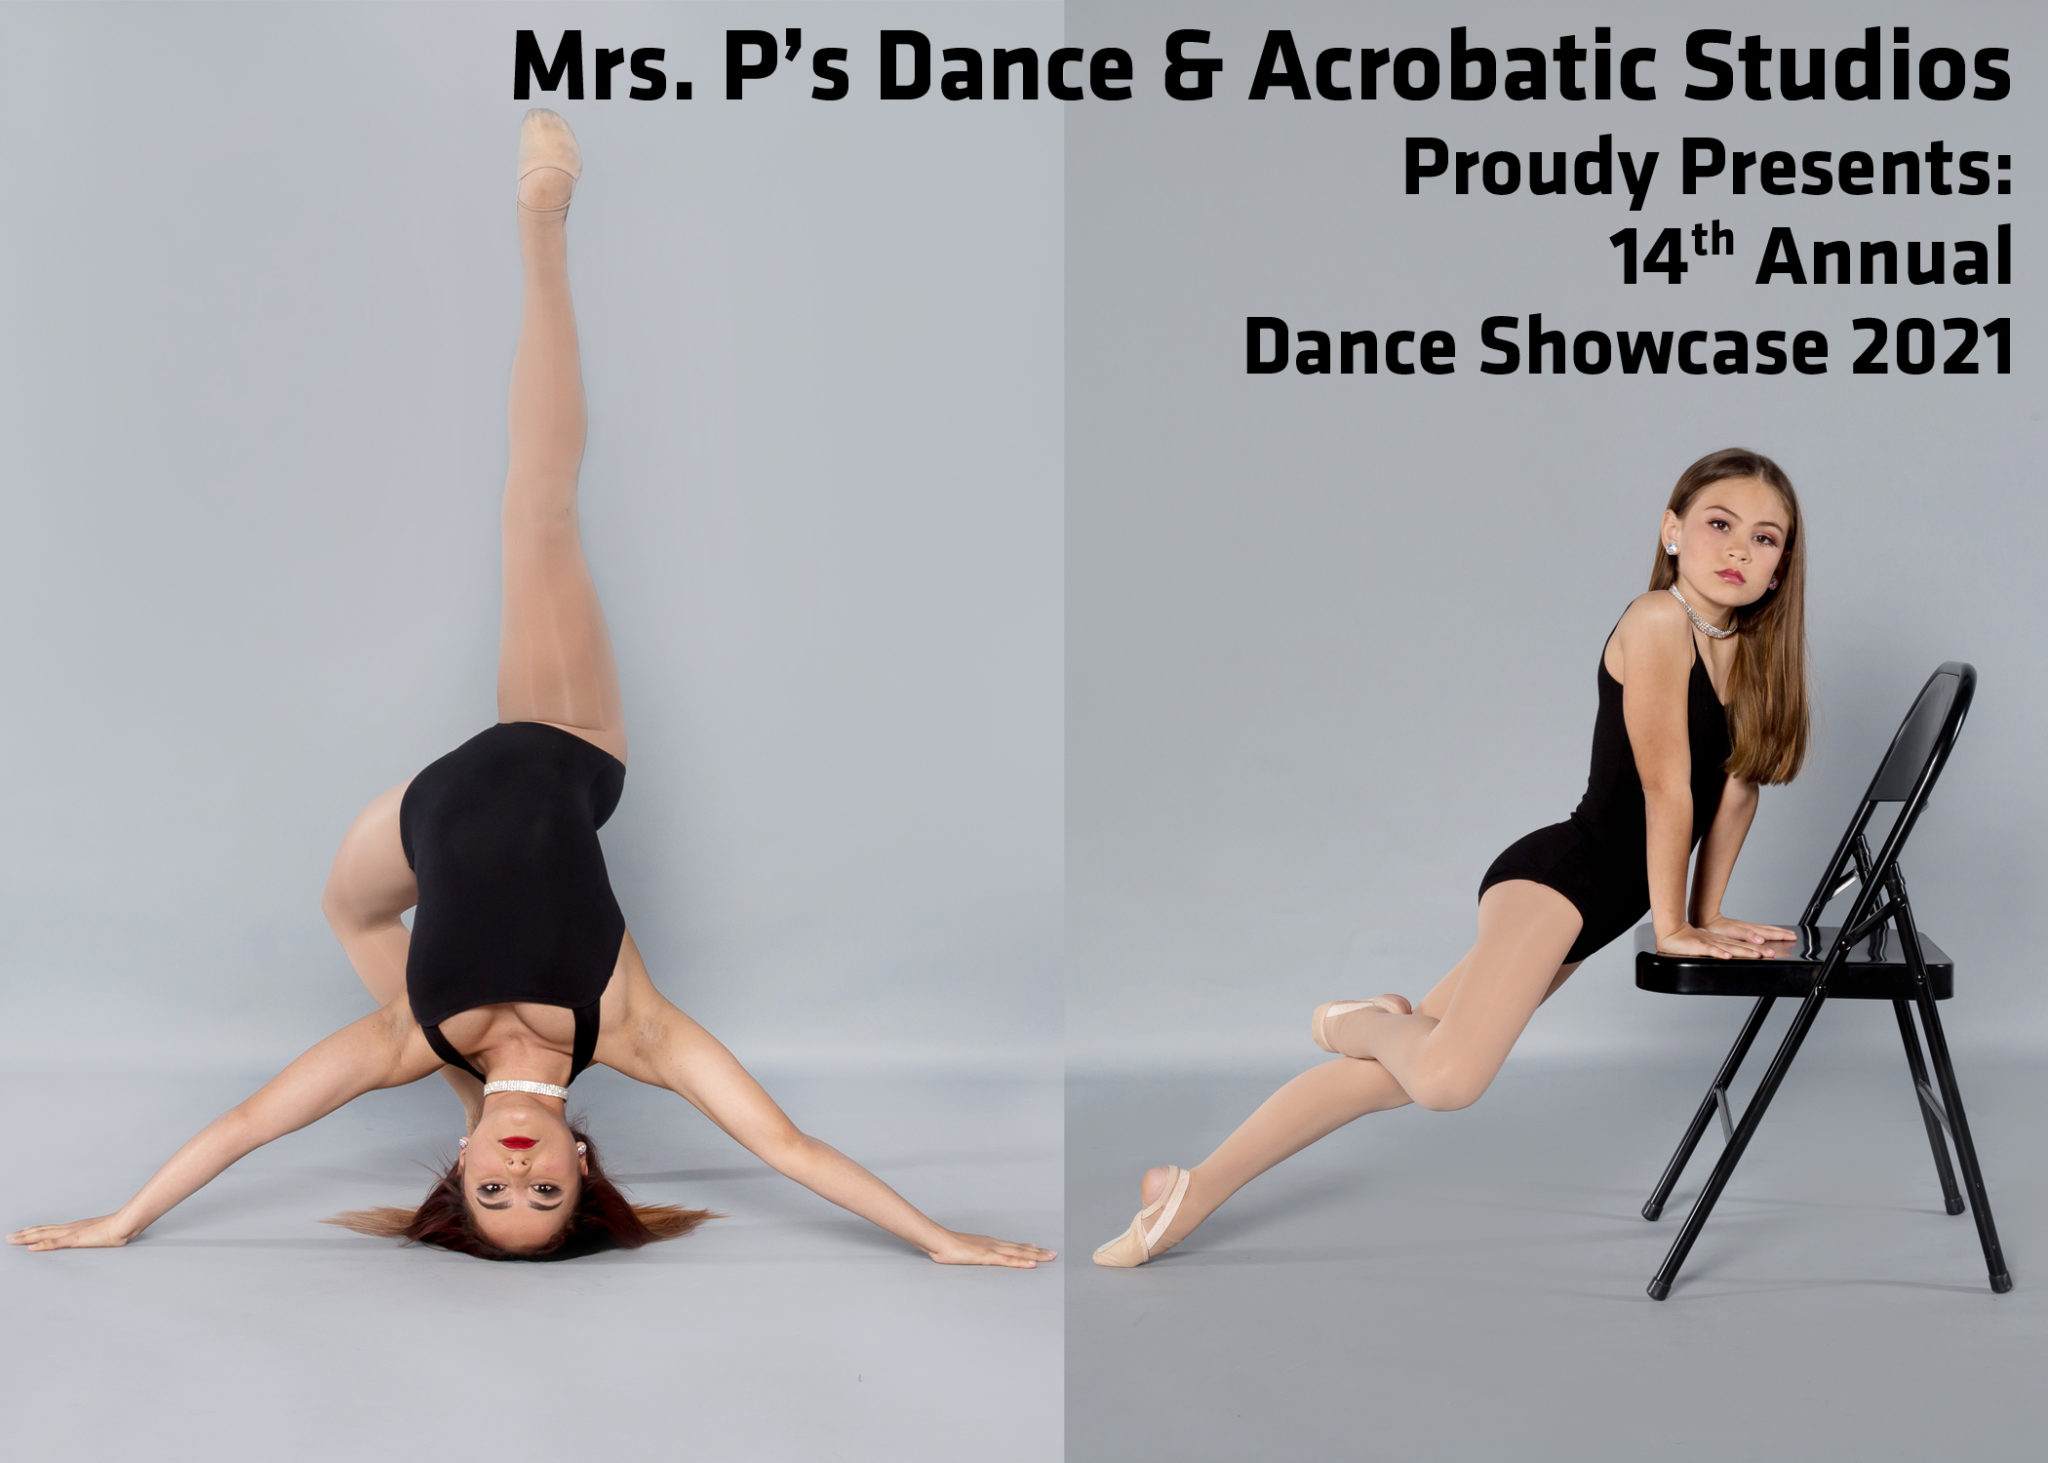 Mrs. P's Dance & Acrobatic Studios Presents: The 14th Annual Dance Showcase 2021